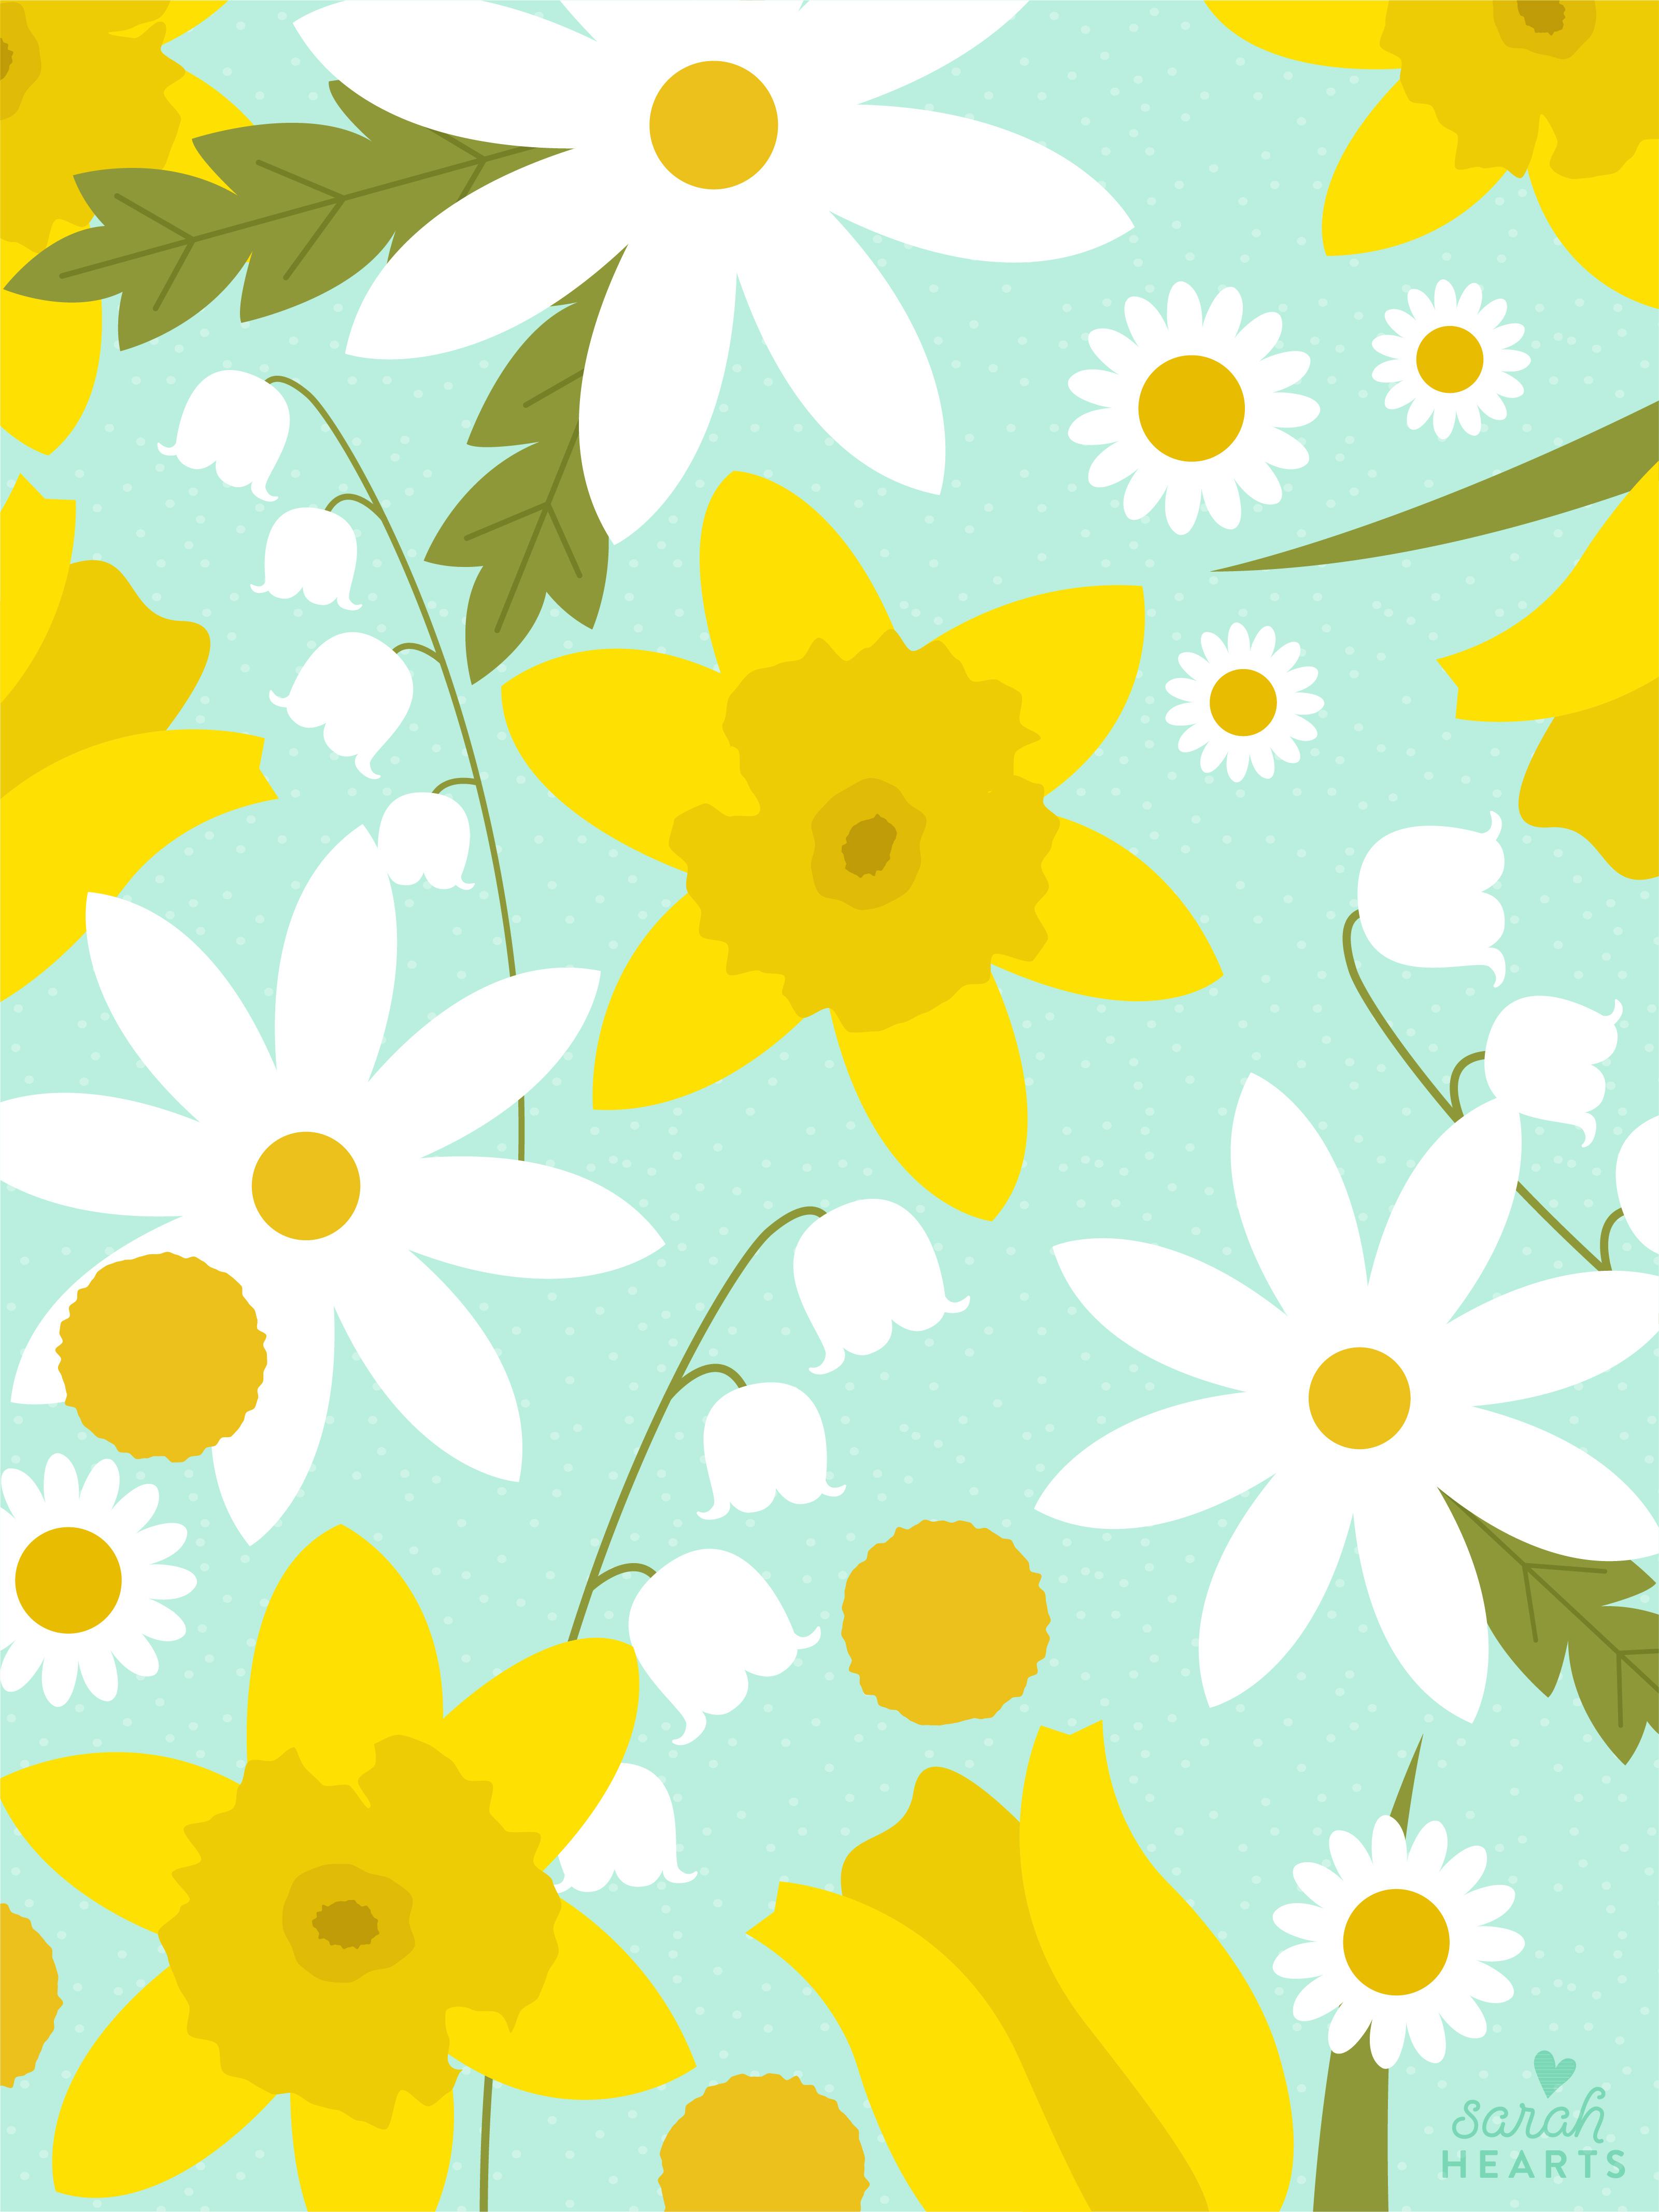 Cute Quote Wallpaper Backgrounds March 2018 Spring Flower Calendar Wallpaper Sarah Hearts